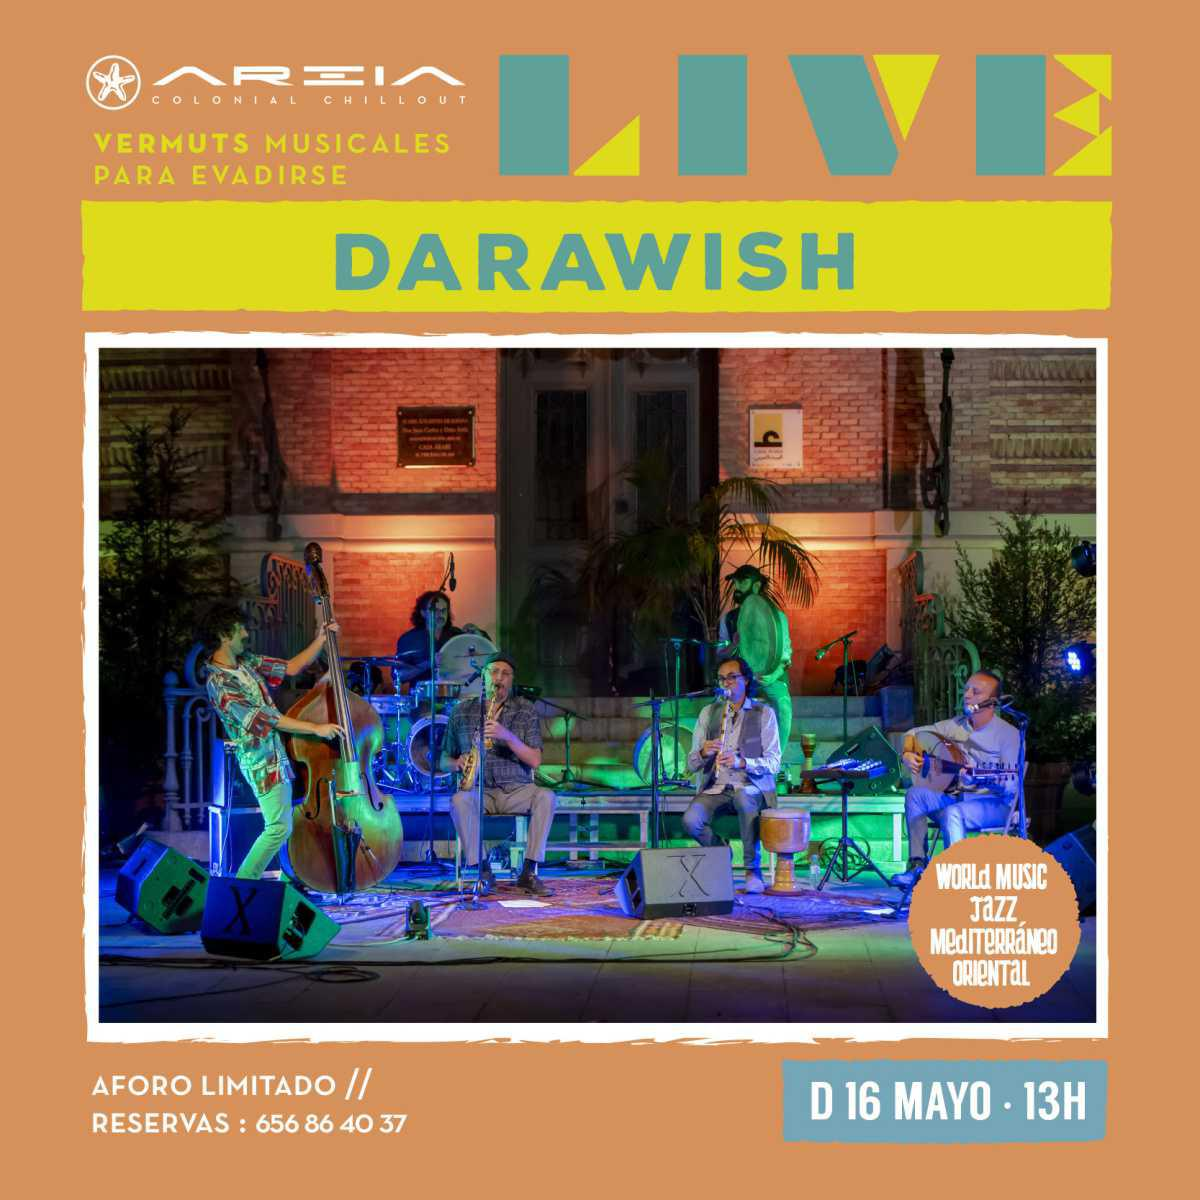 Areia Live presenta DARAWISH – world music / jazz mediterráneo oriental